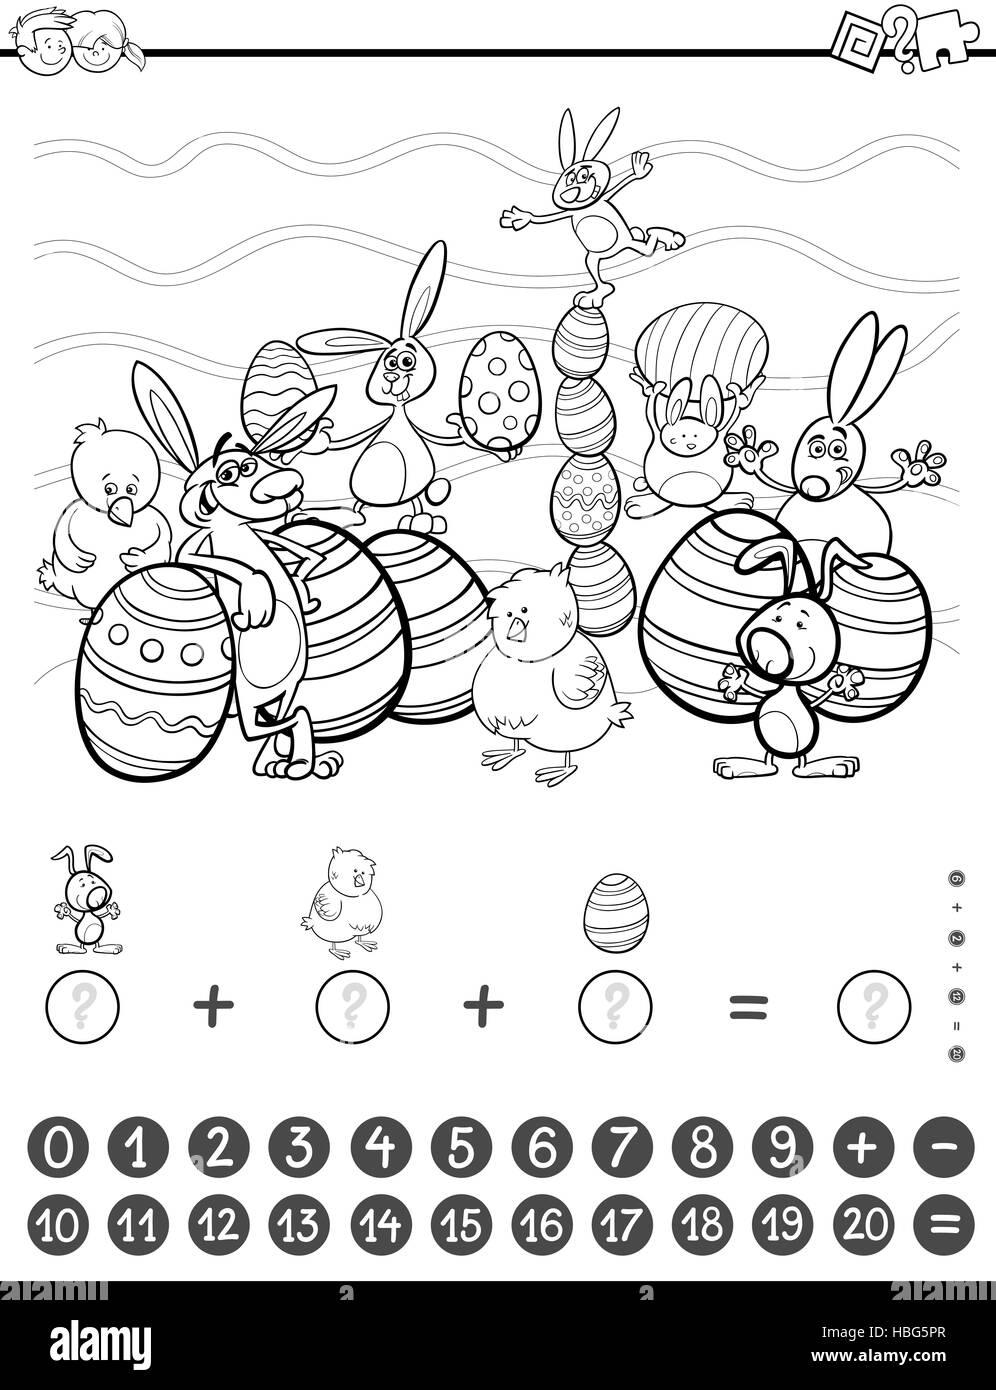 Libro Para Colorear De Tareas De Matemáticas Foto Imagen De Stock